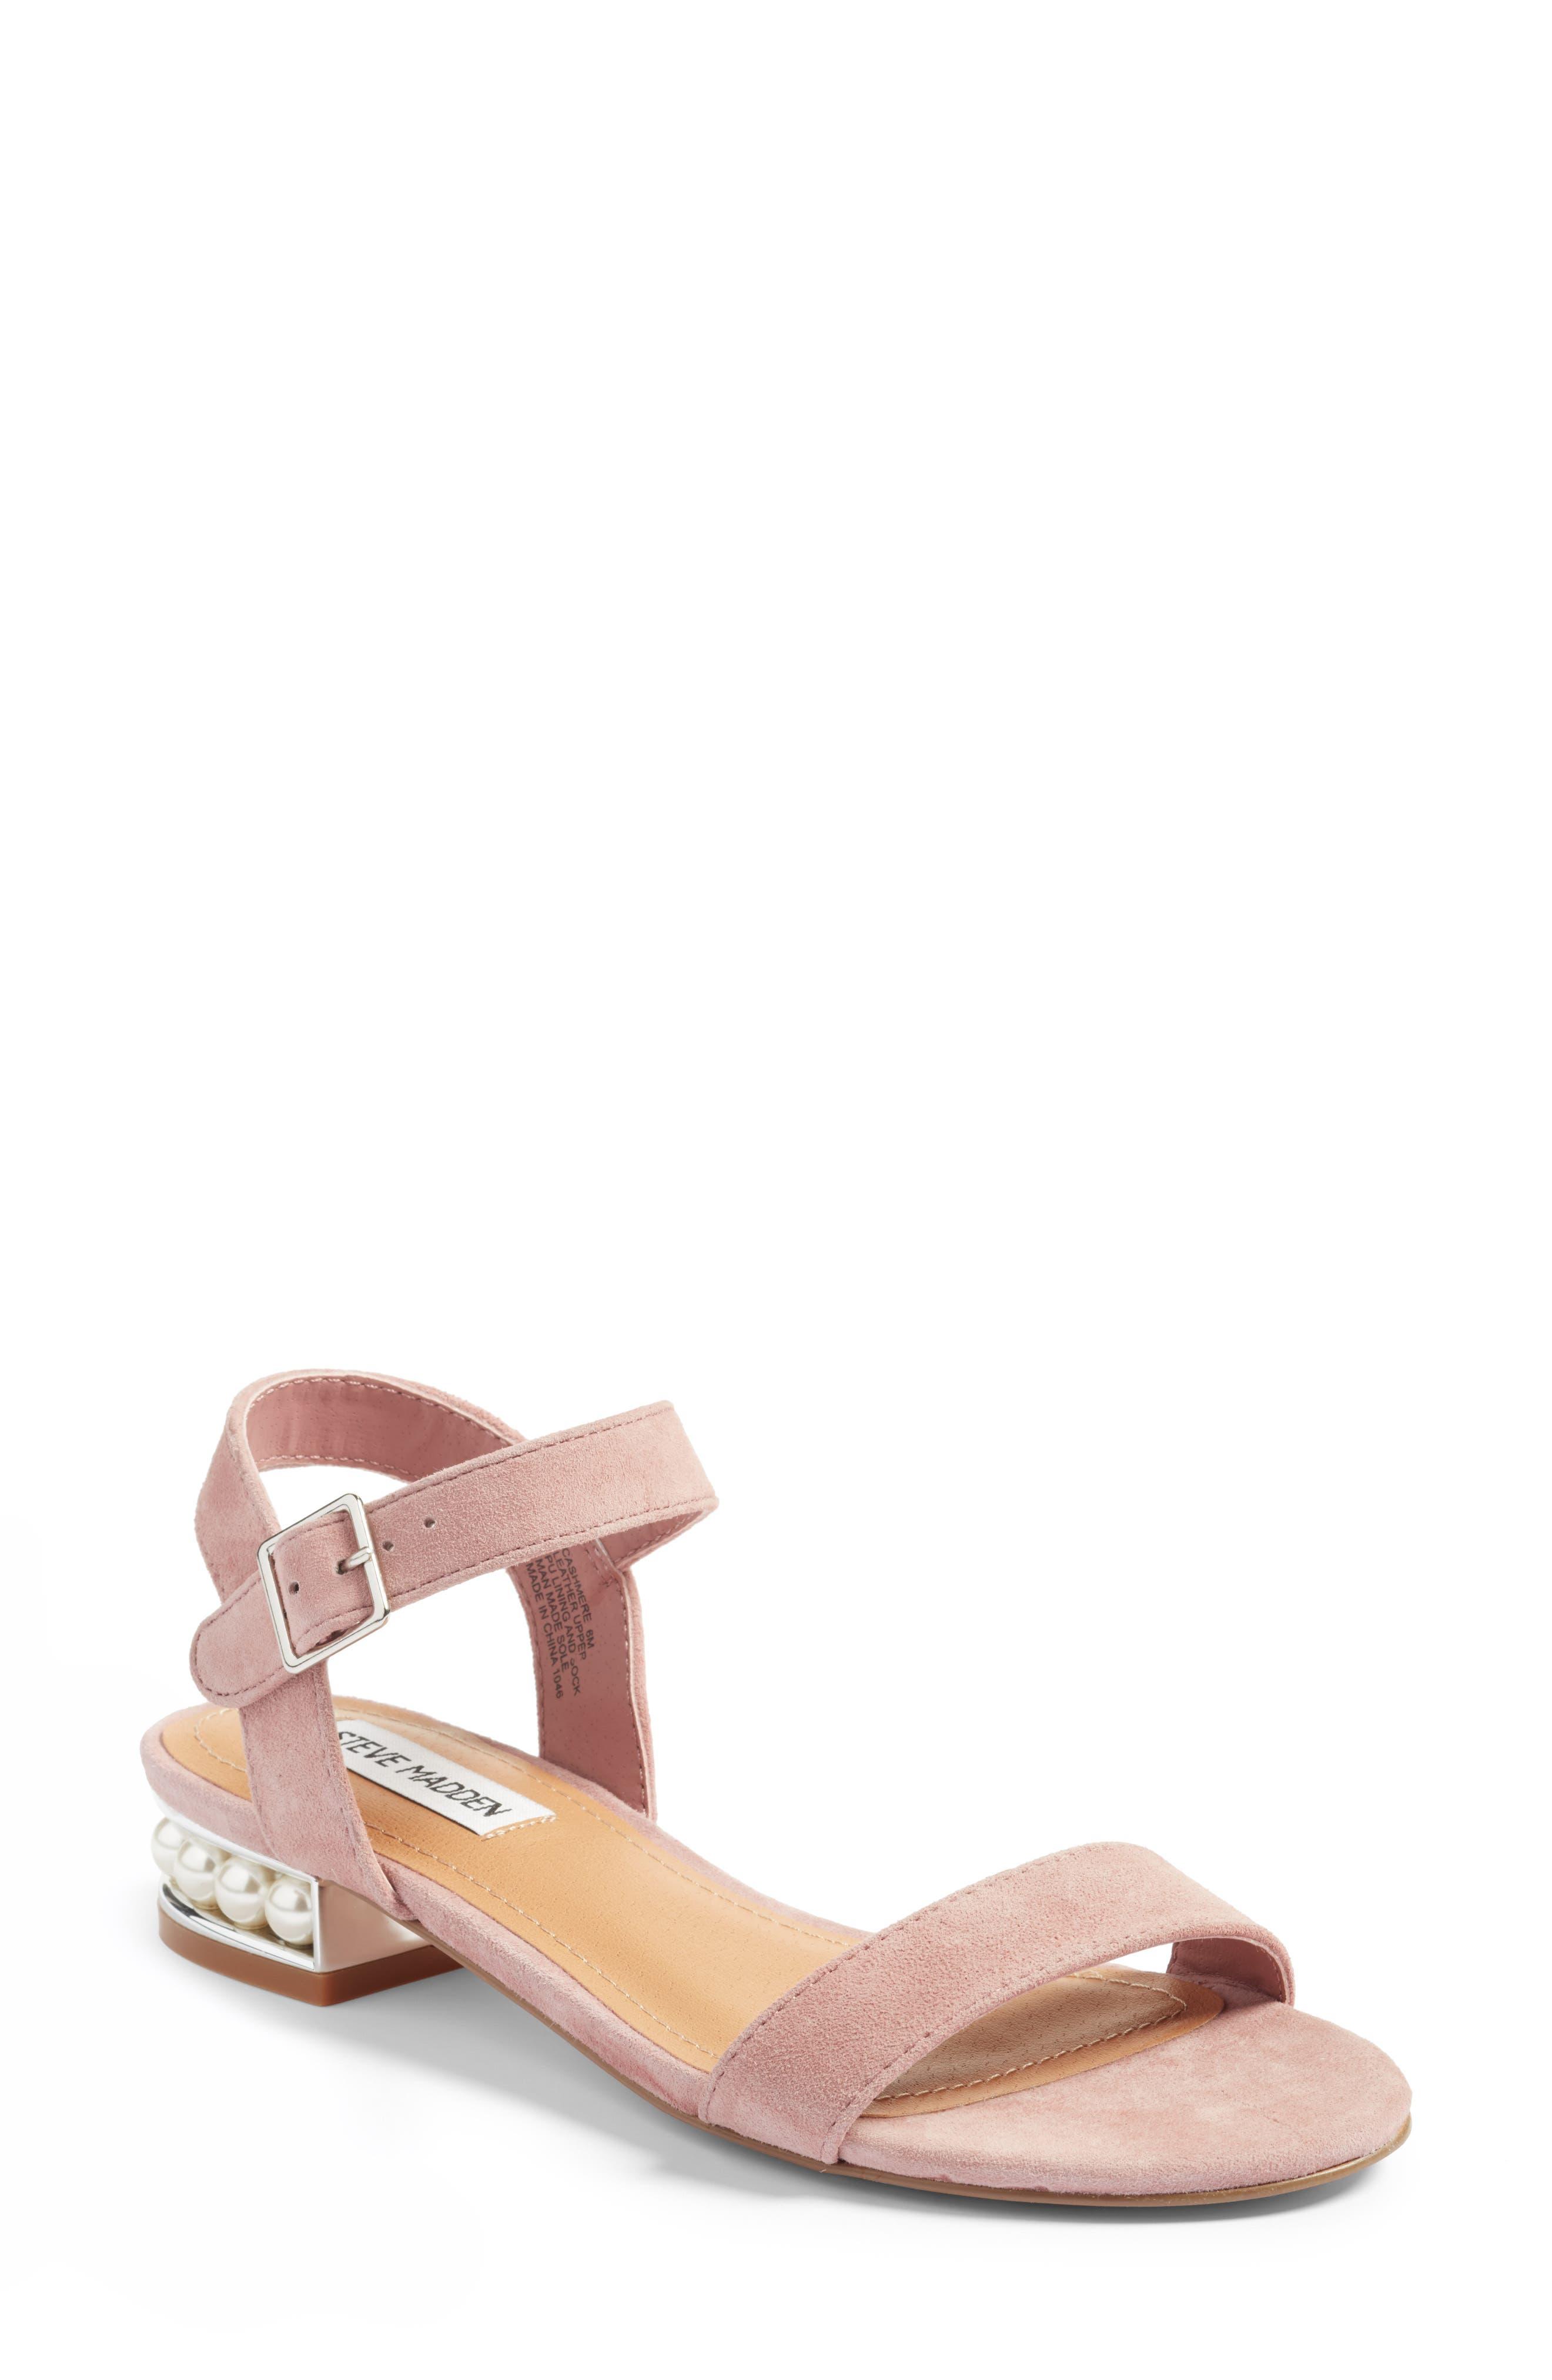 Main Image - Steve Madden Embellished Sandal (Women)